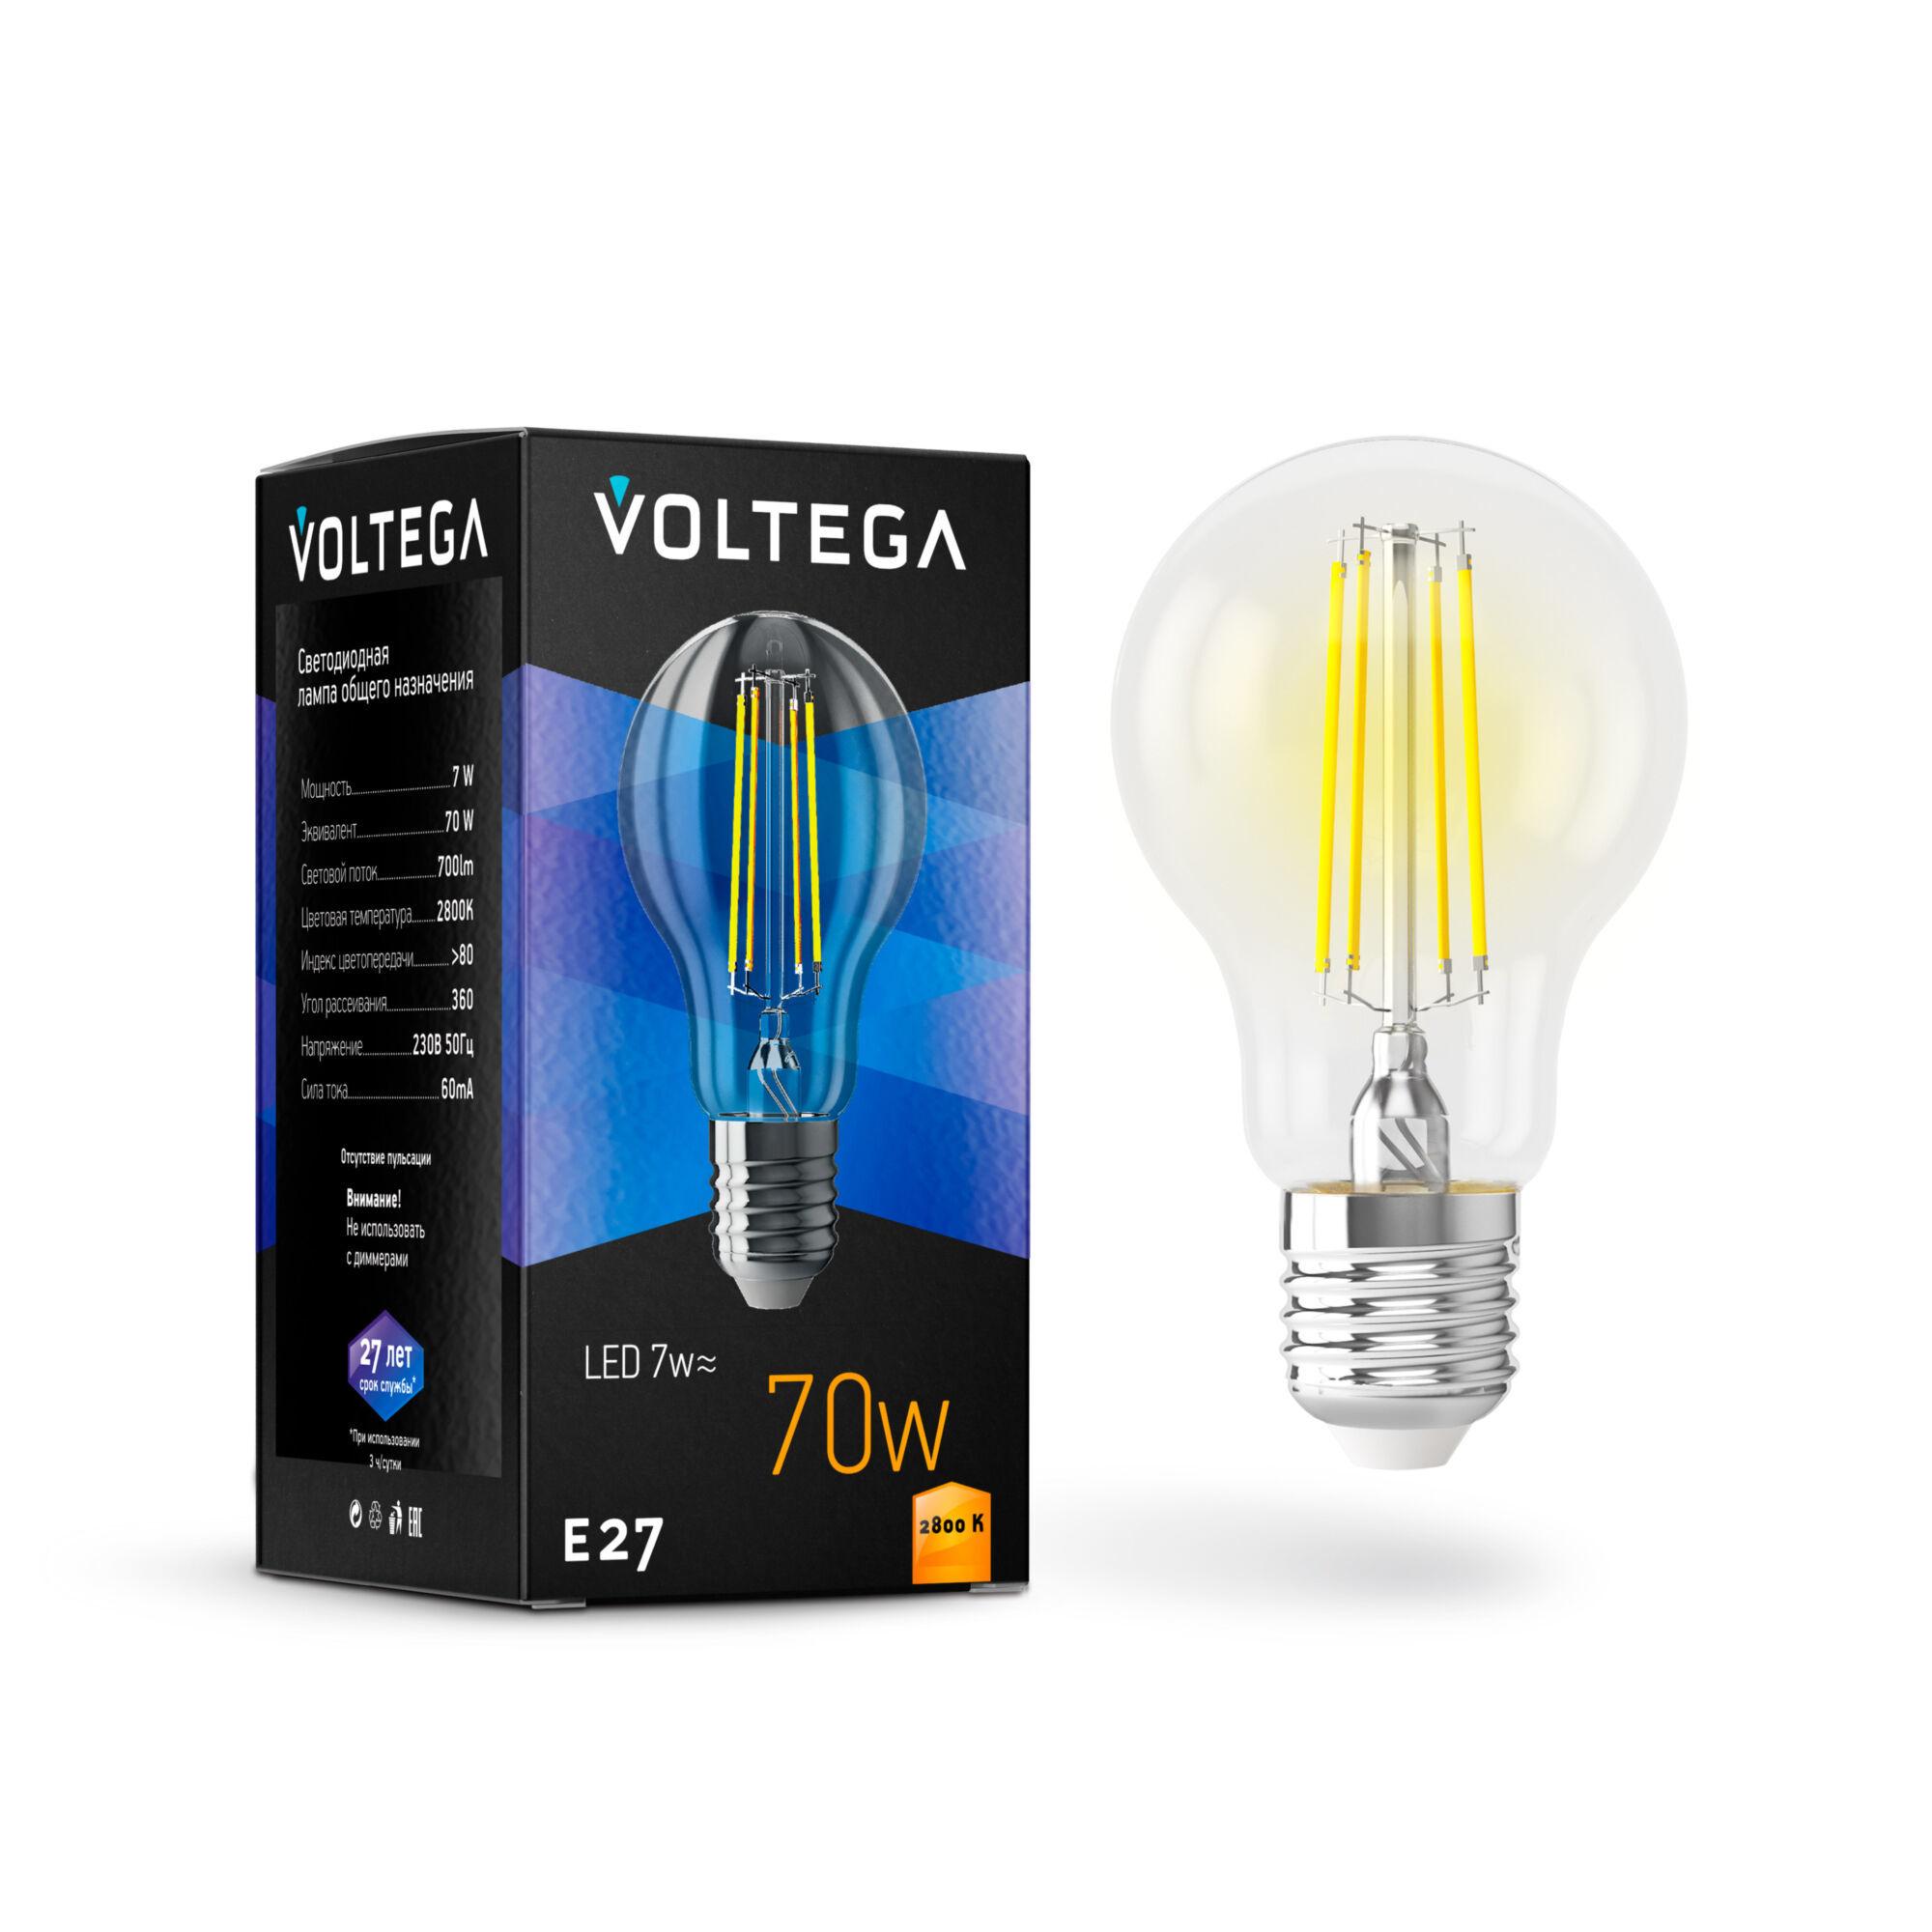 Филаментная светодиодная лампа Voltega Crystal 7140 груша E27 7W, 2800K (теплый) 220V, гарантия 3 года - фото 2